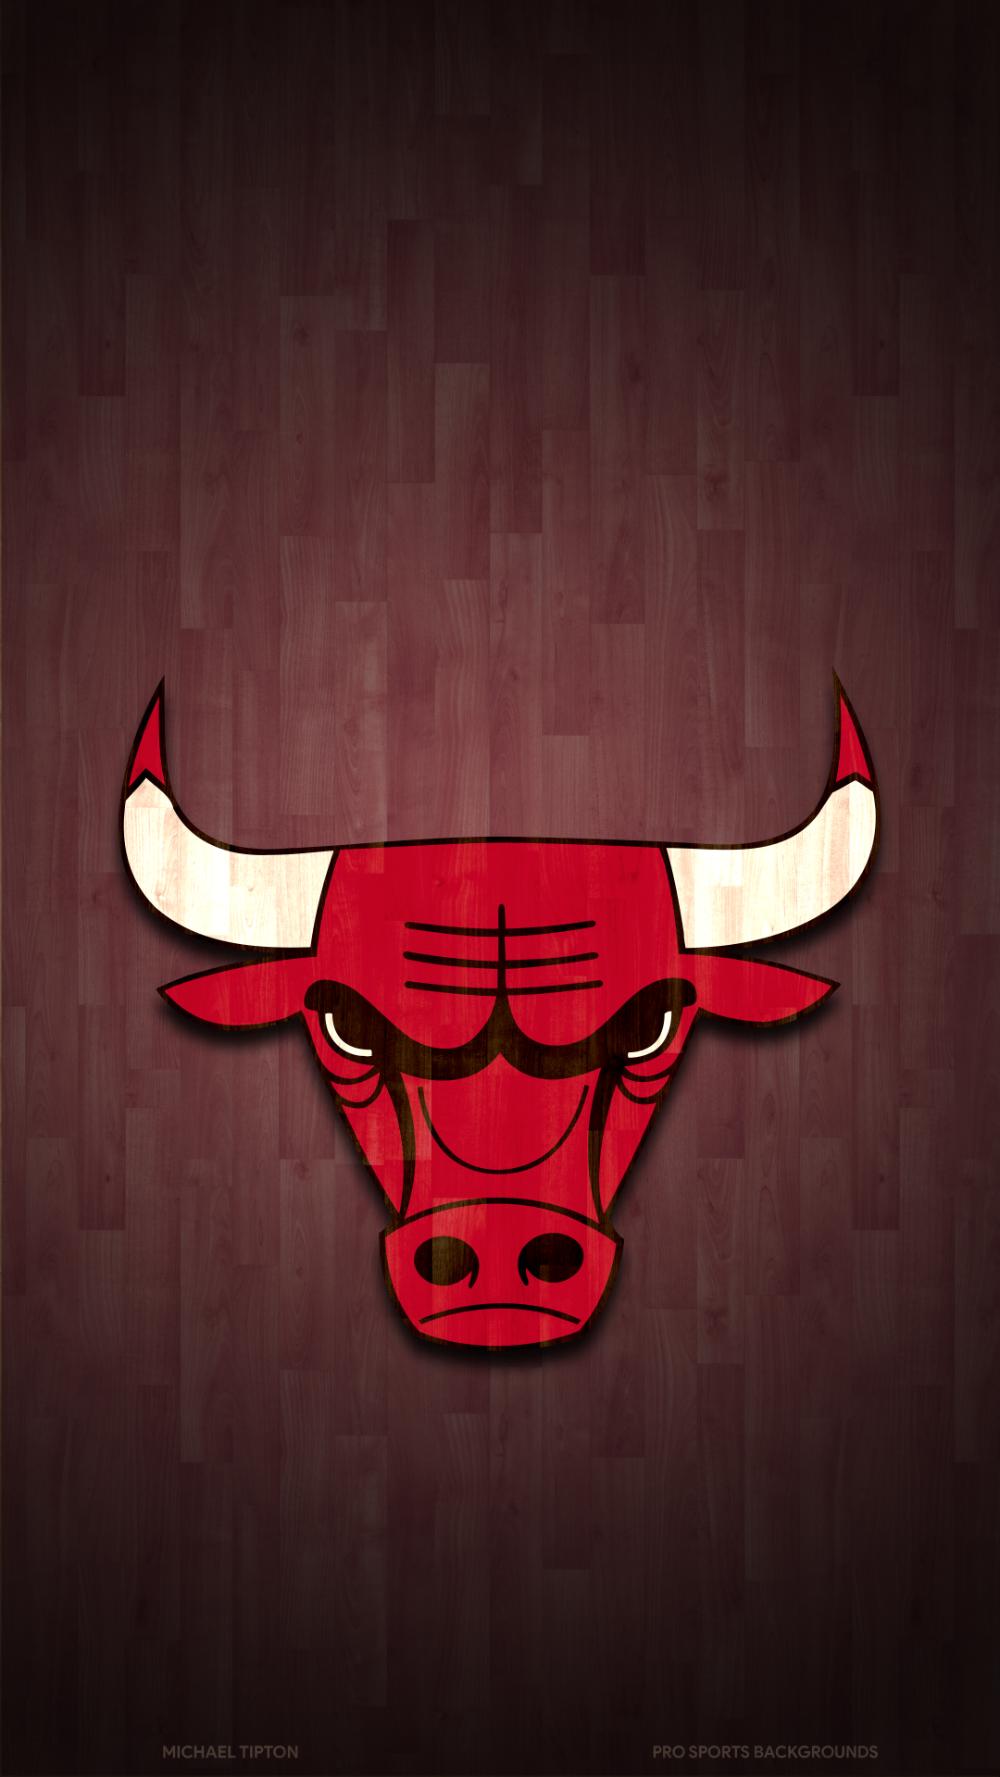 Chicago Bulls Wallpapers Chicago Bulls Wallpaper Chicago Bulls Bulls Wallpaper